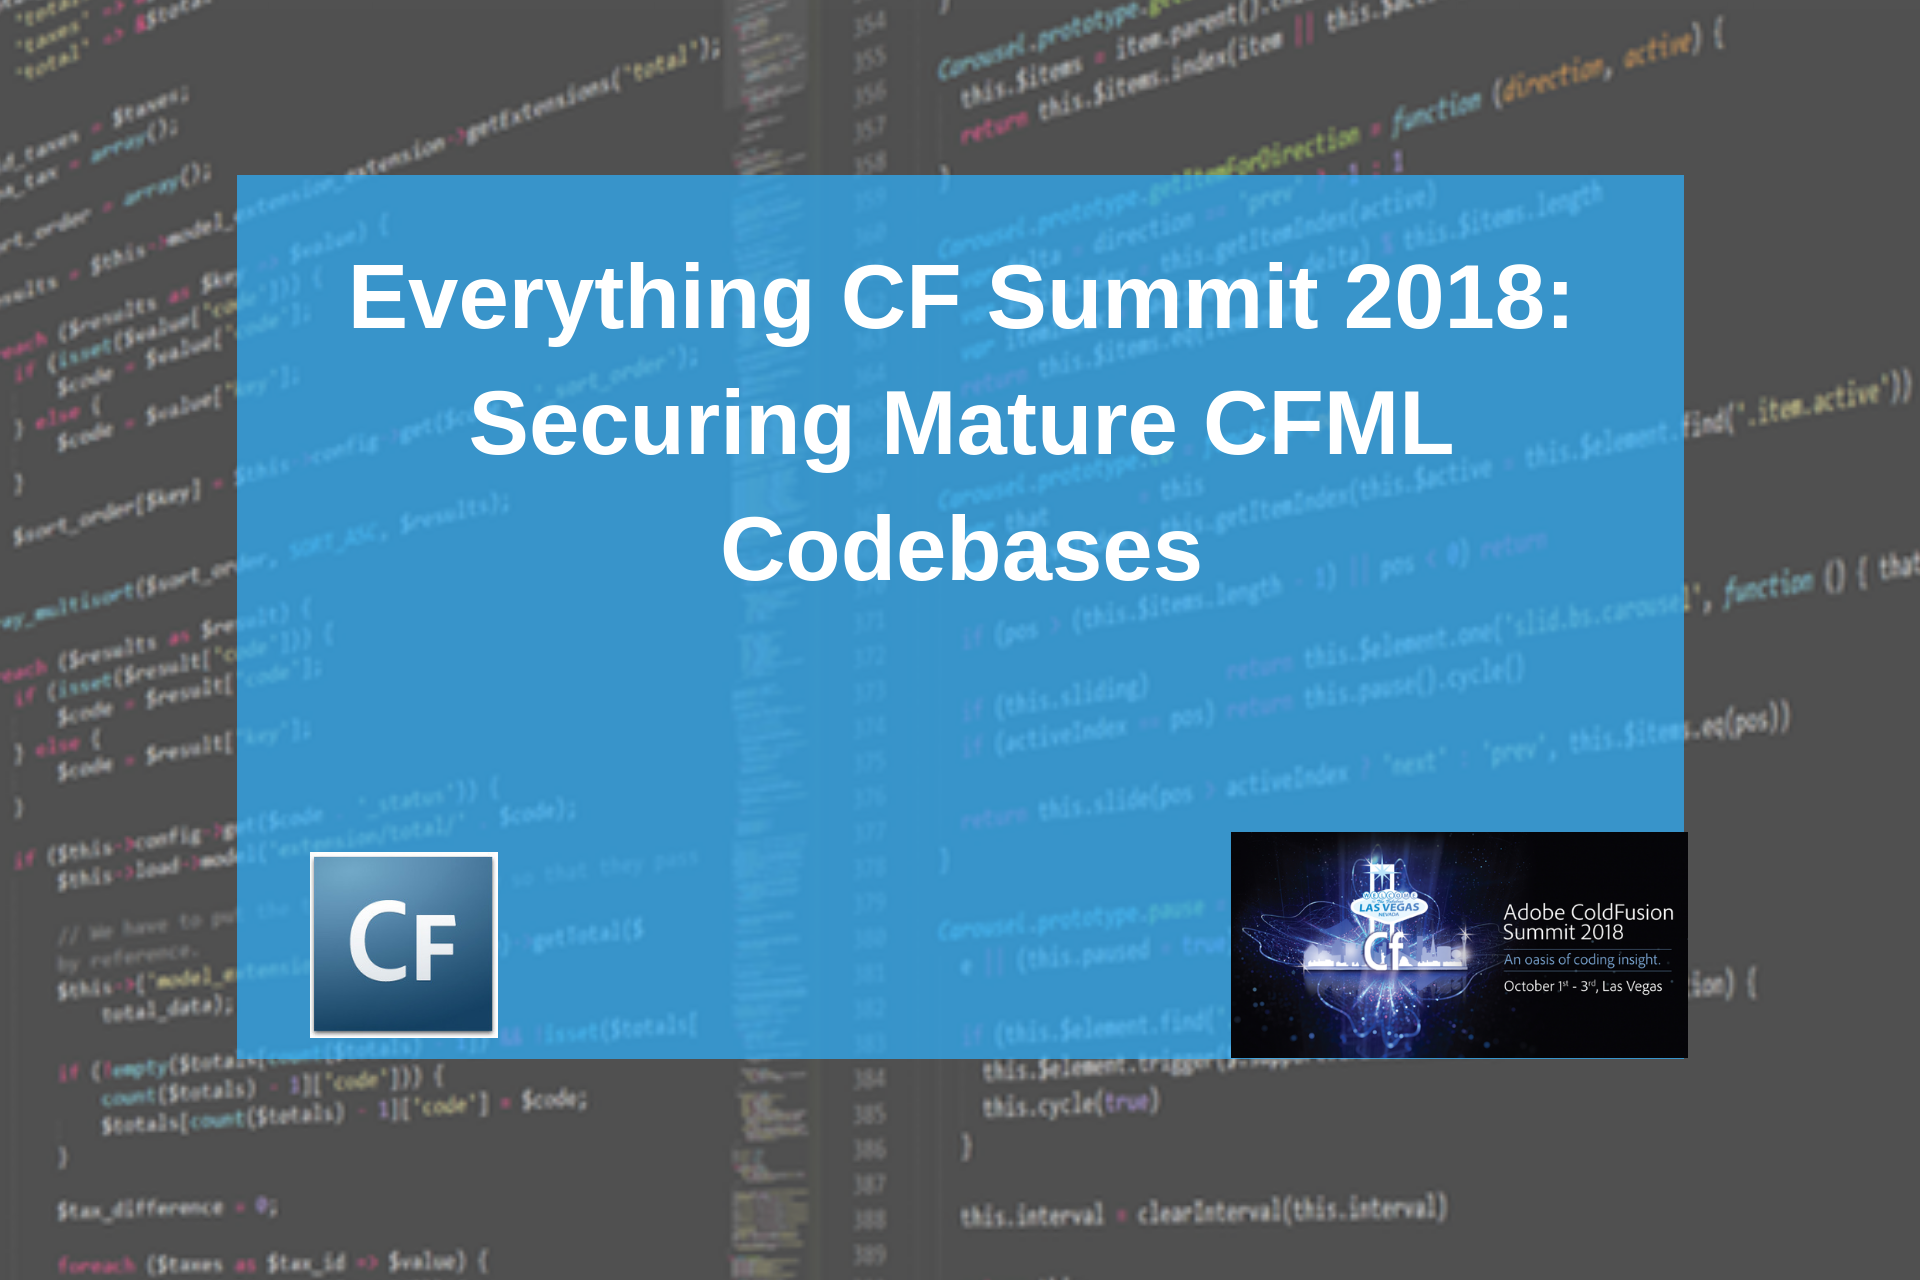 Everything CF Summit 2018: Securing Mature CFML Codebases